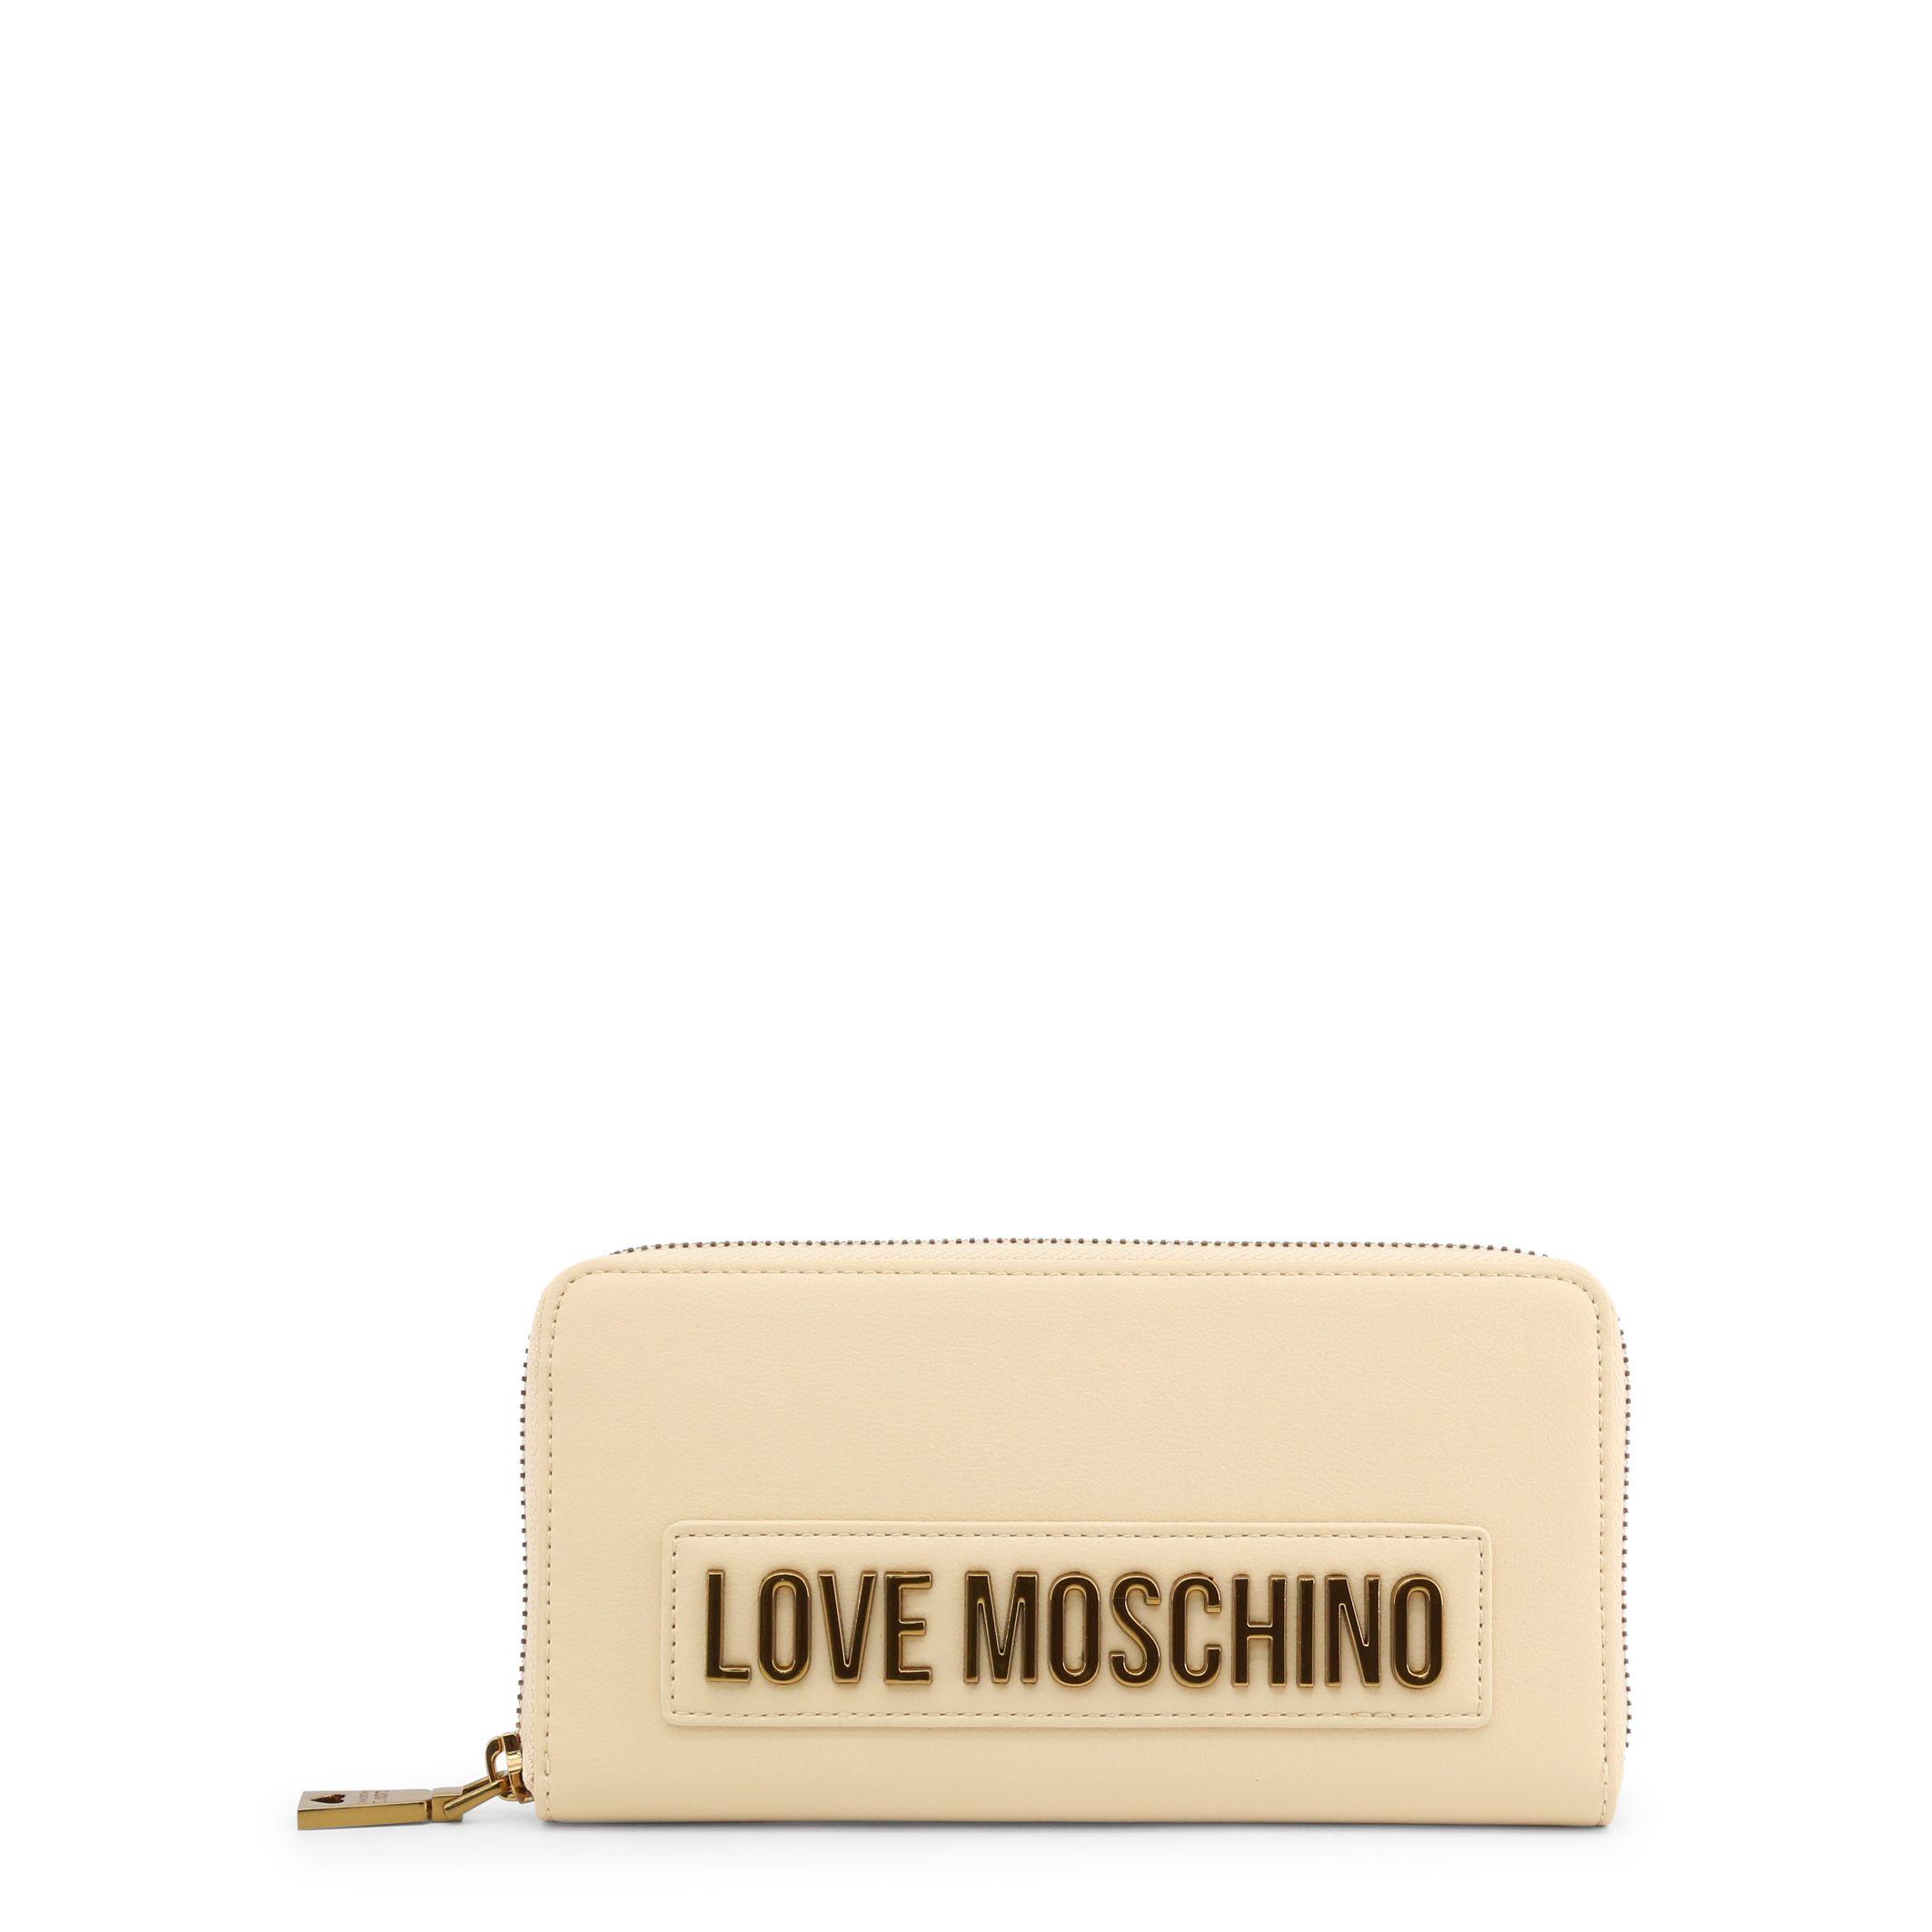 Love Moschino - JC5622PP1BLK - Brown